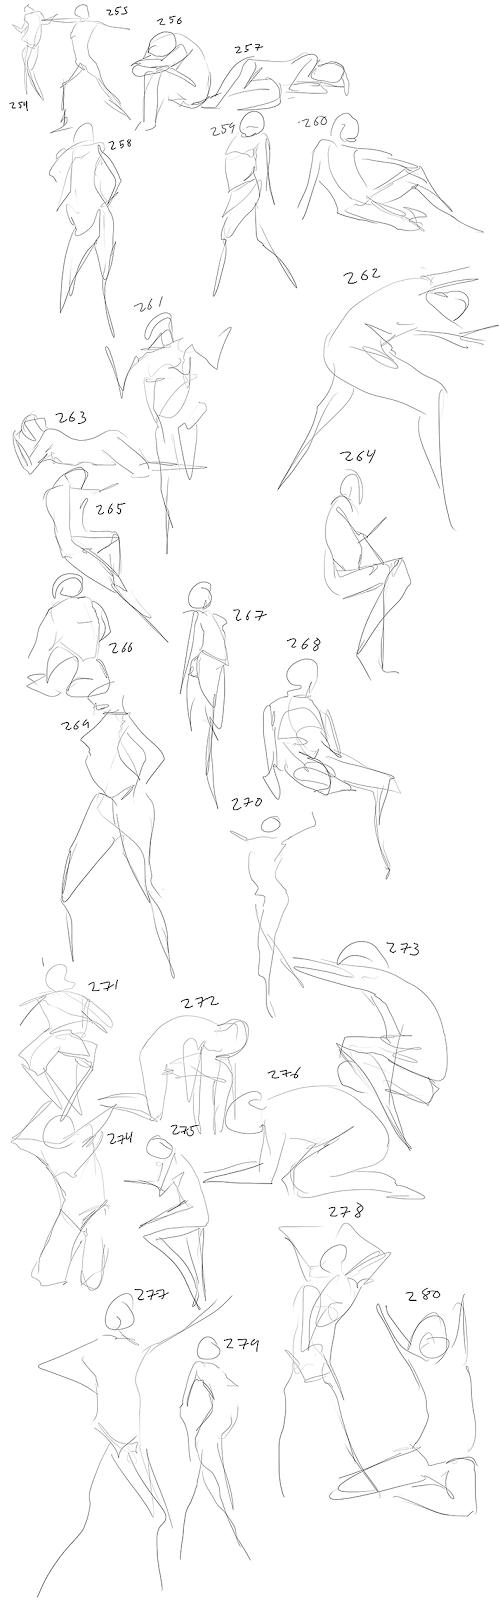 [Image: Gestures_09.png]